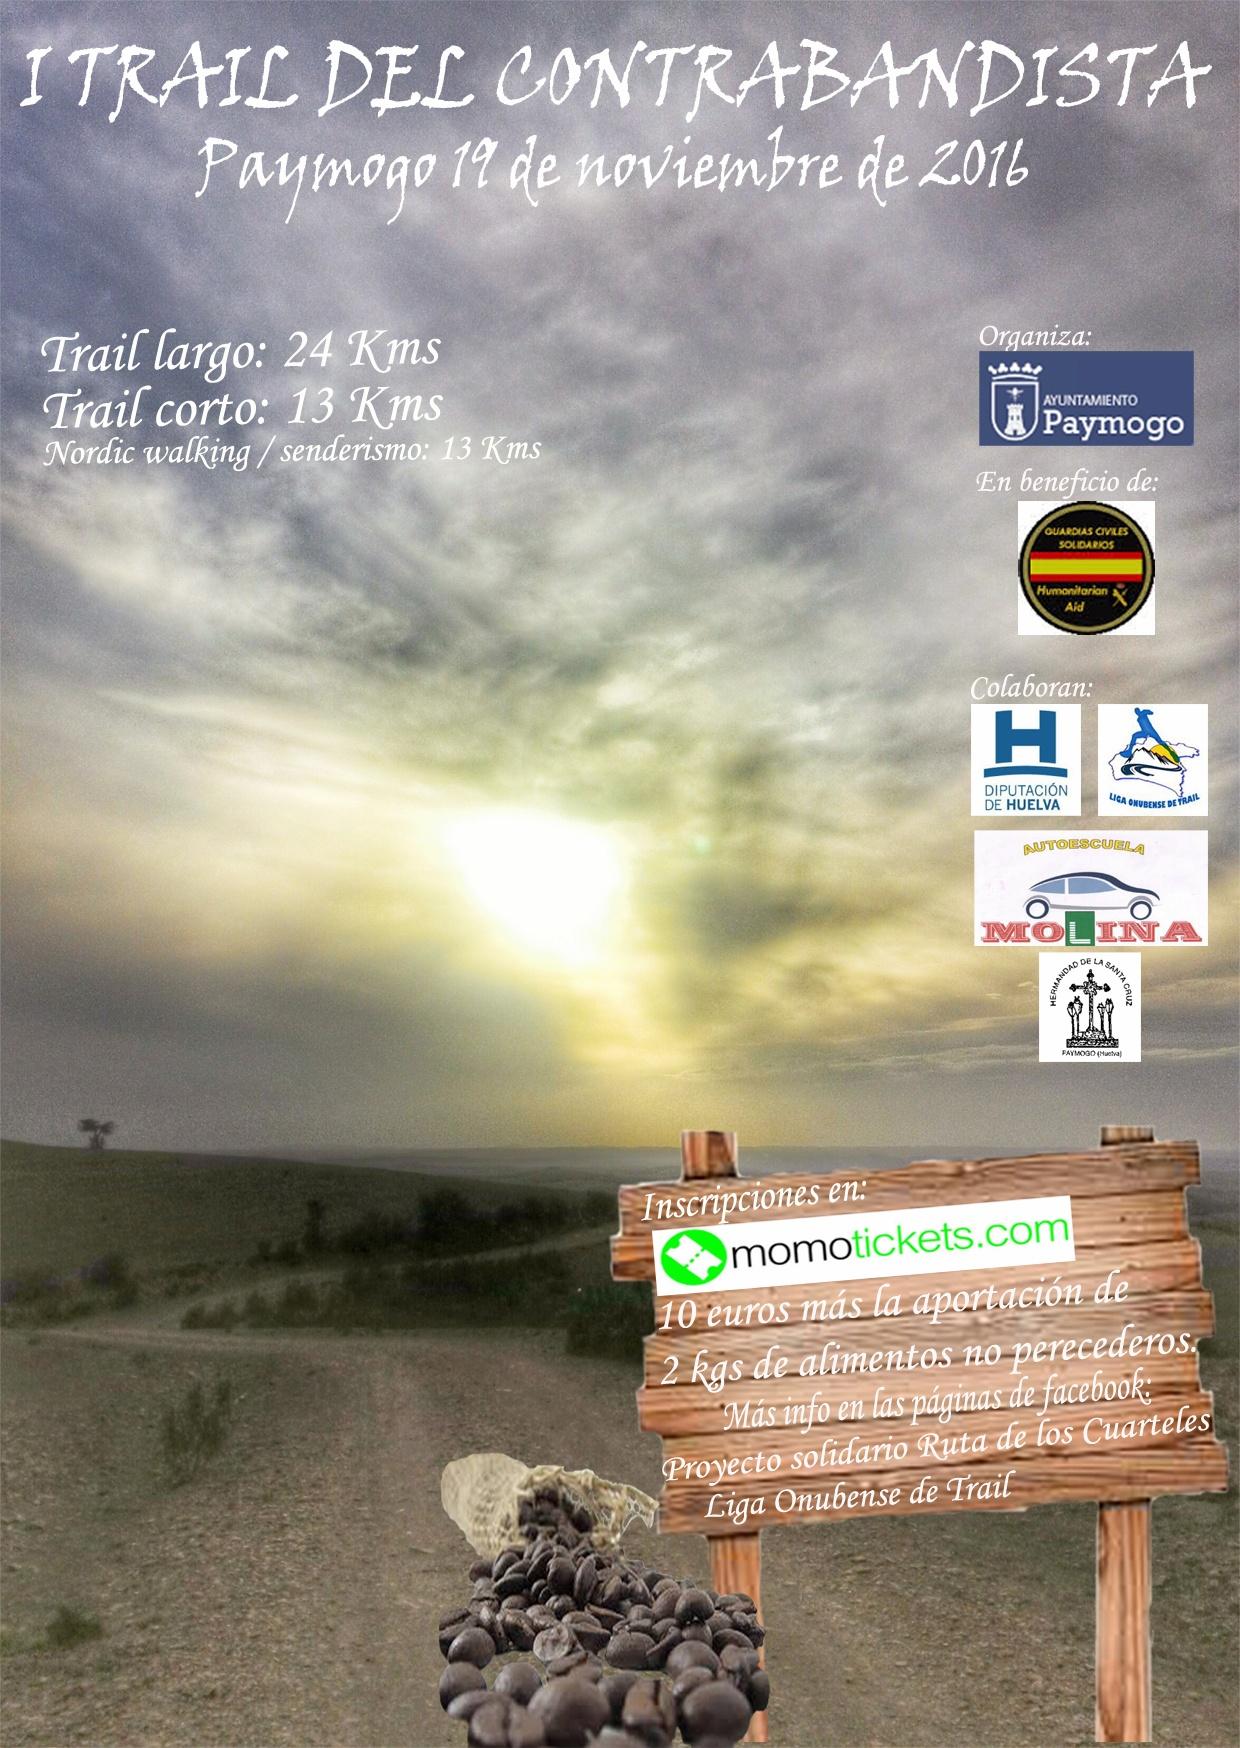 Paymogo acoge el I Trail del Contrabandista